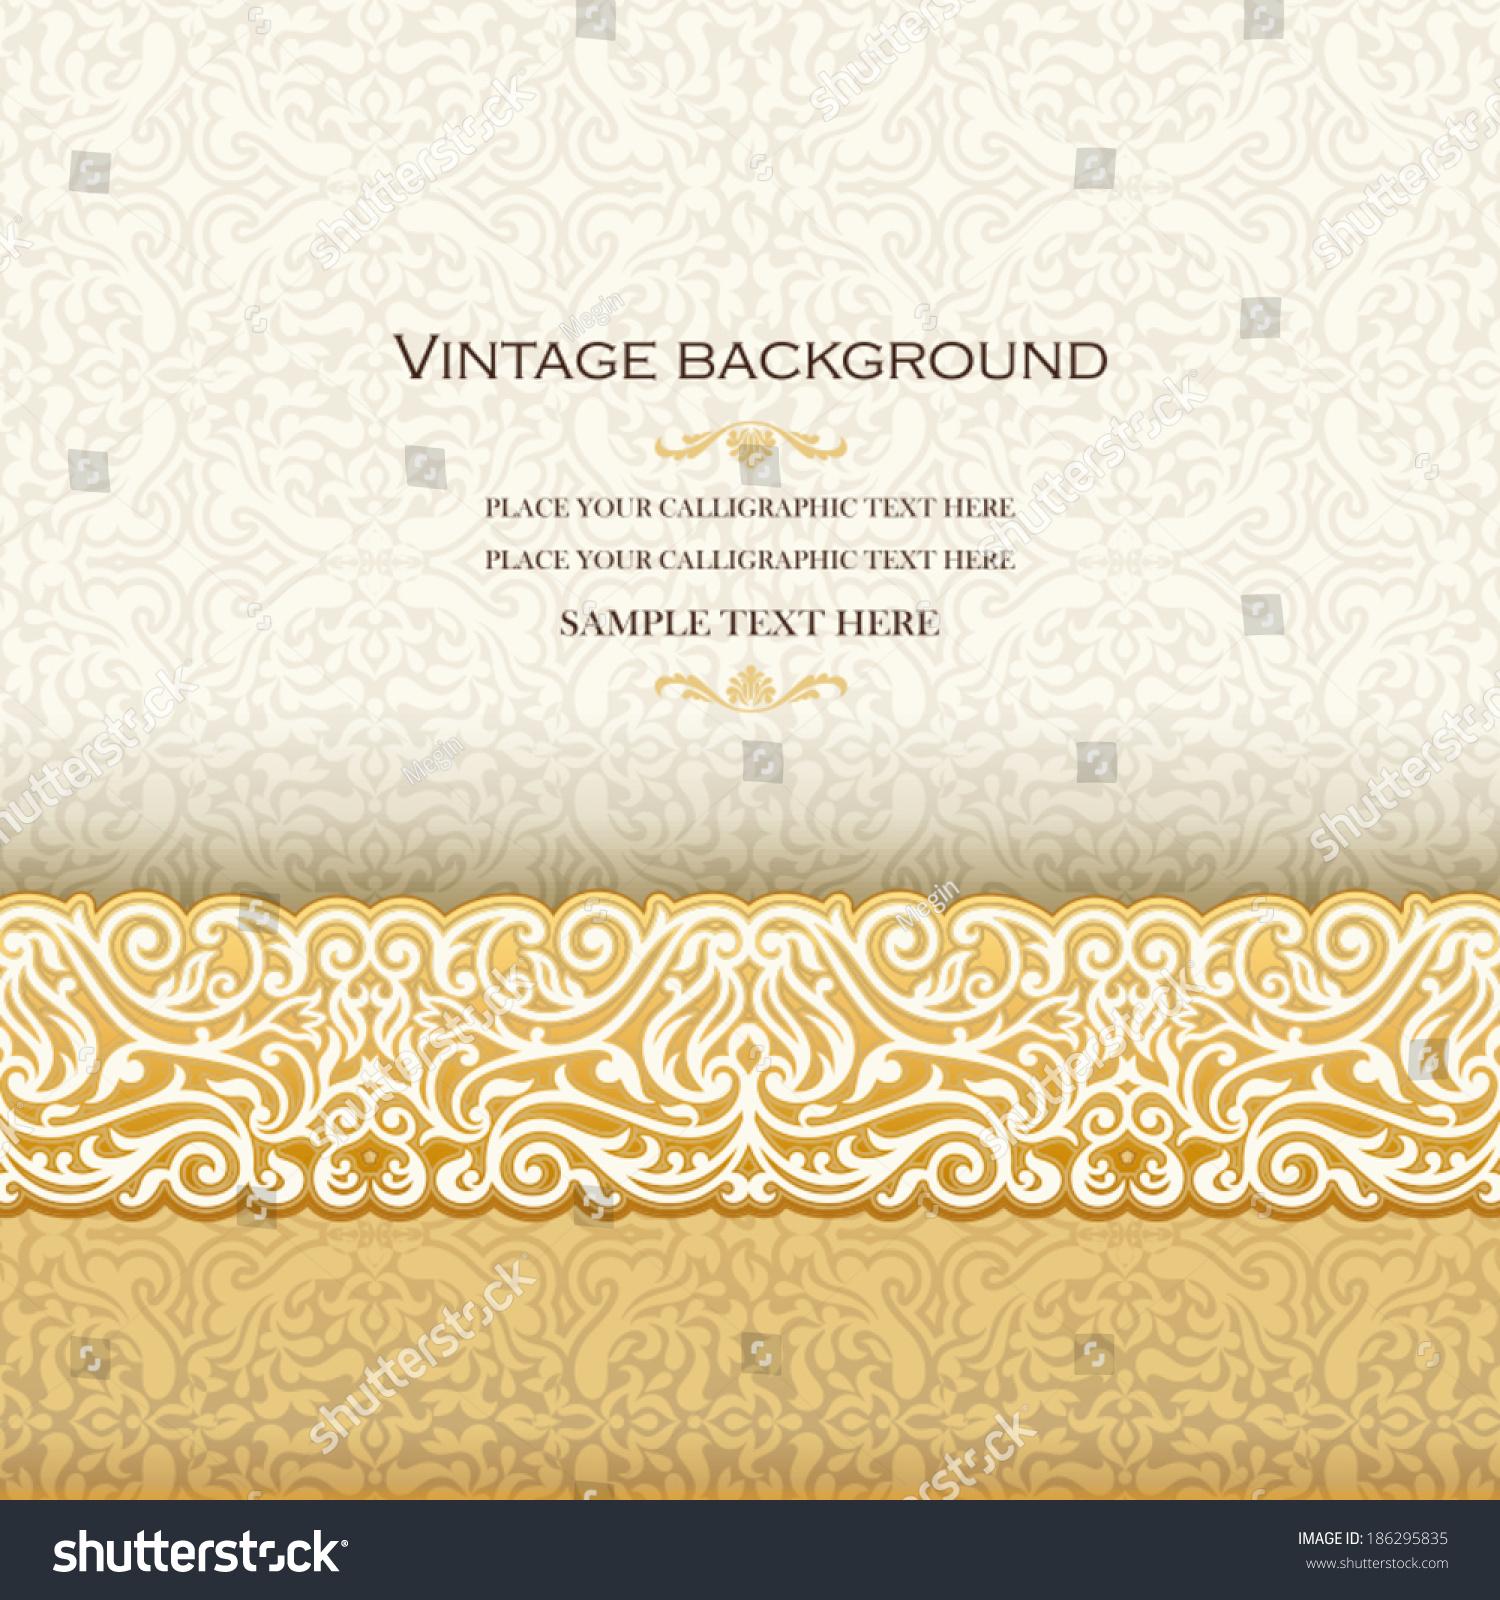 Vintage background antique invitation card royal imagem vetorial de vintage background antique invitation card royal greeting with lace and floral ornament beautiful stopboris Images